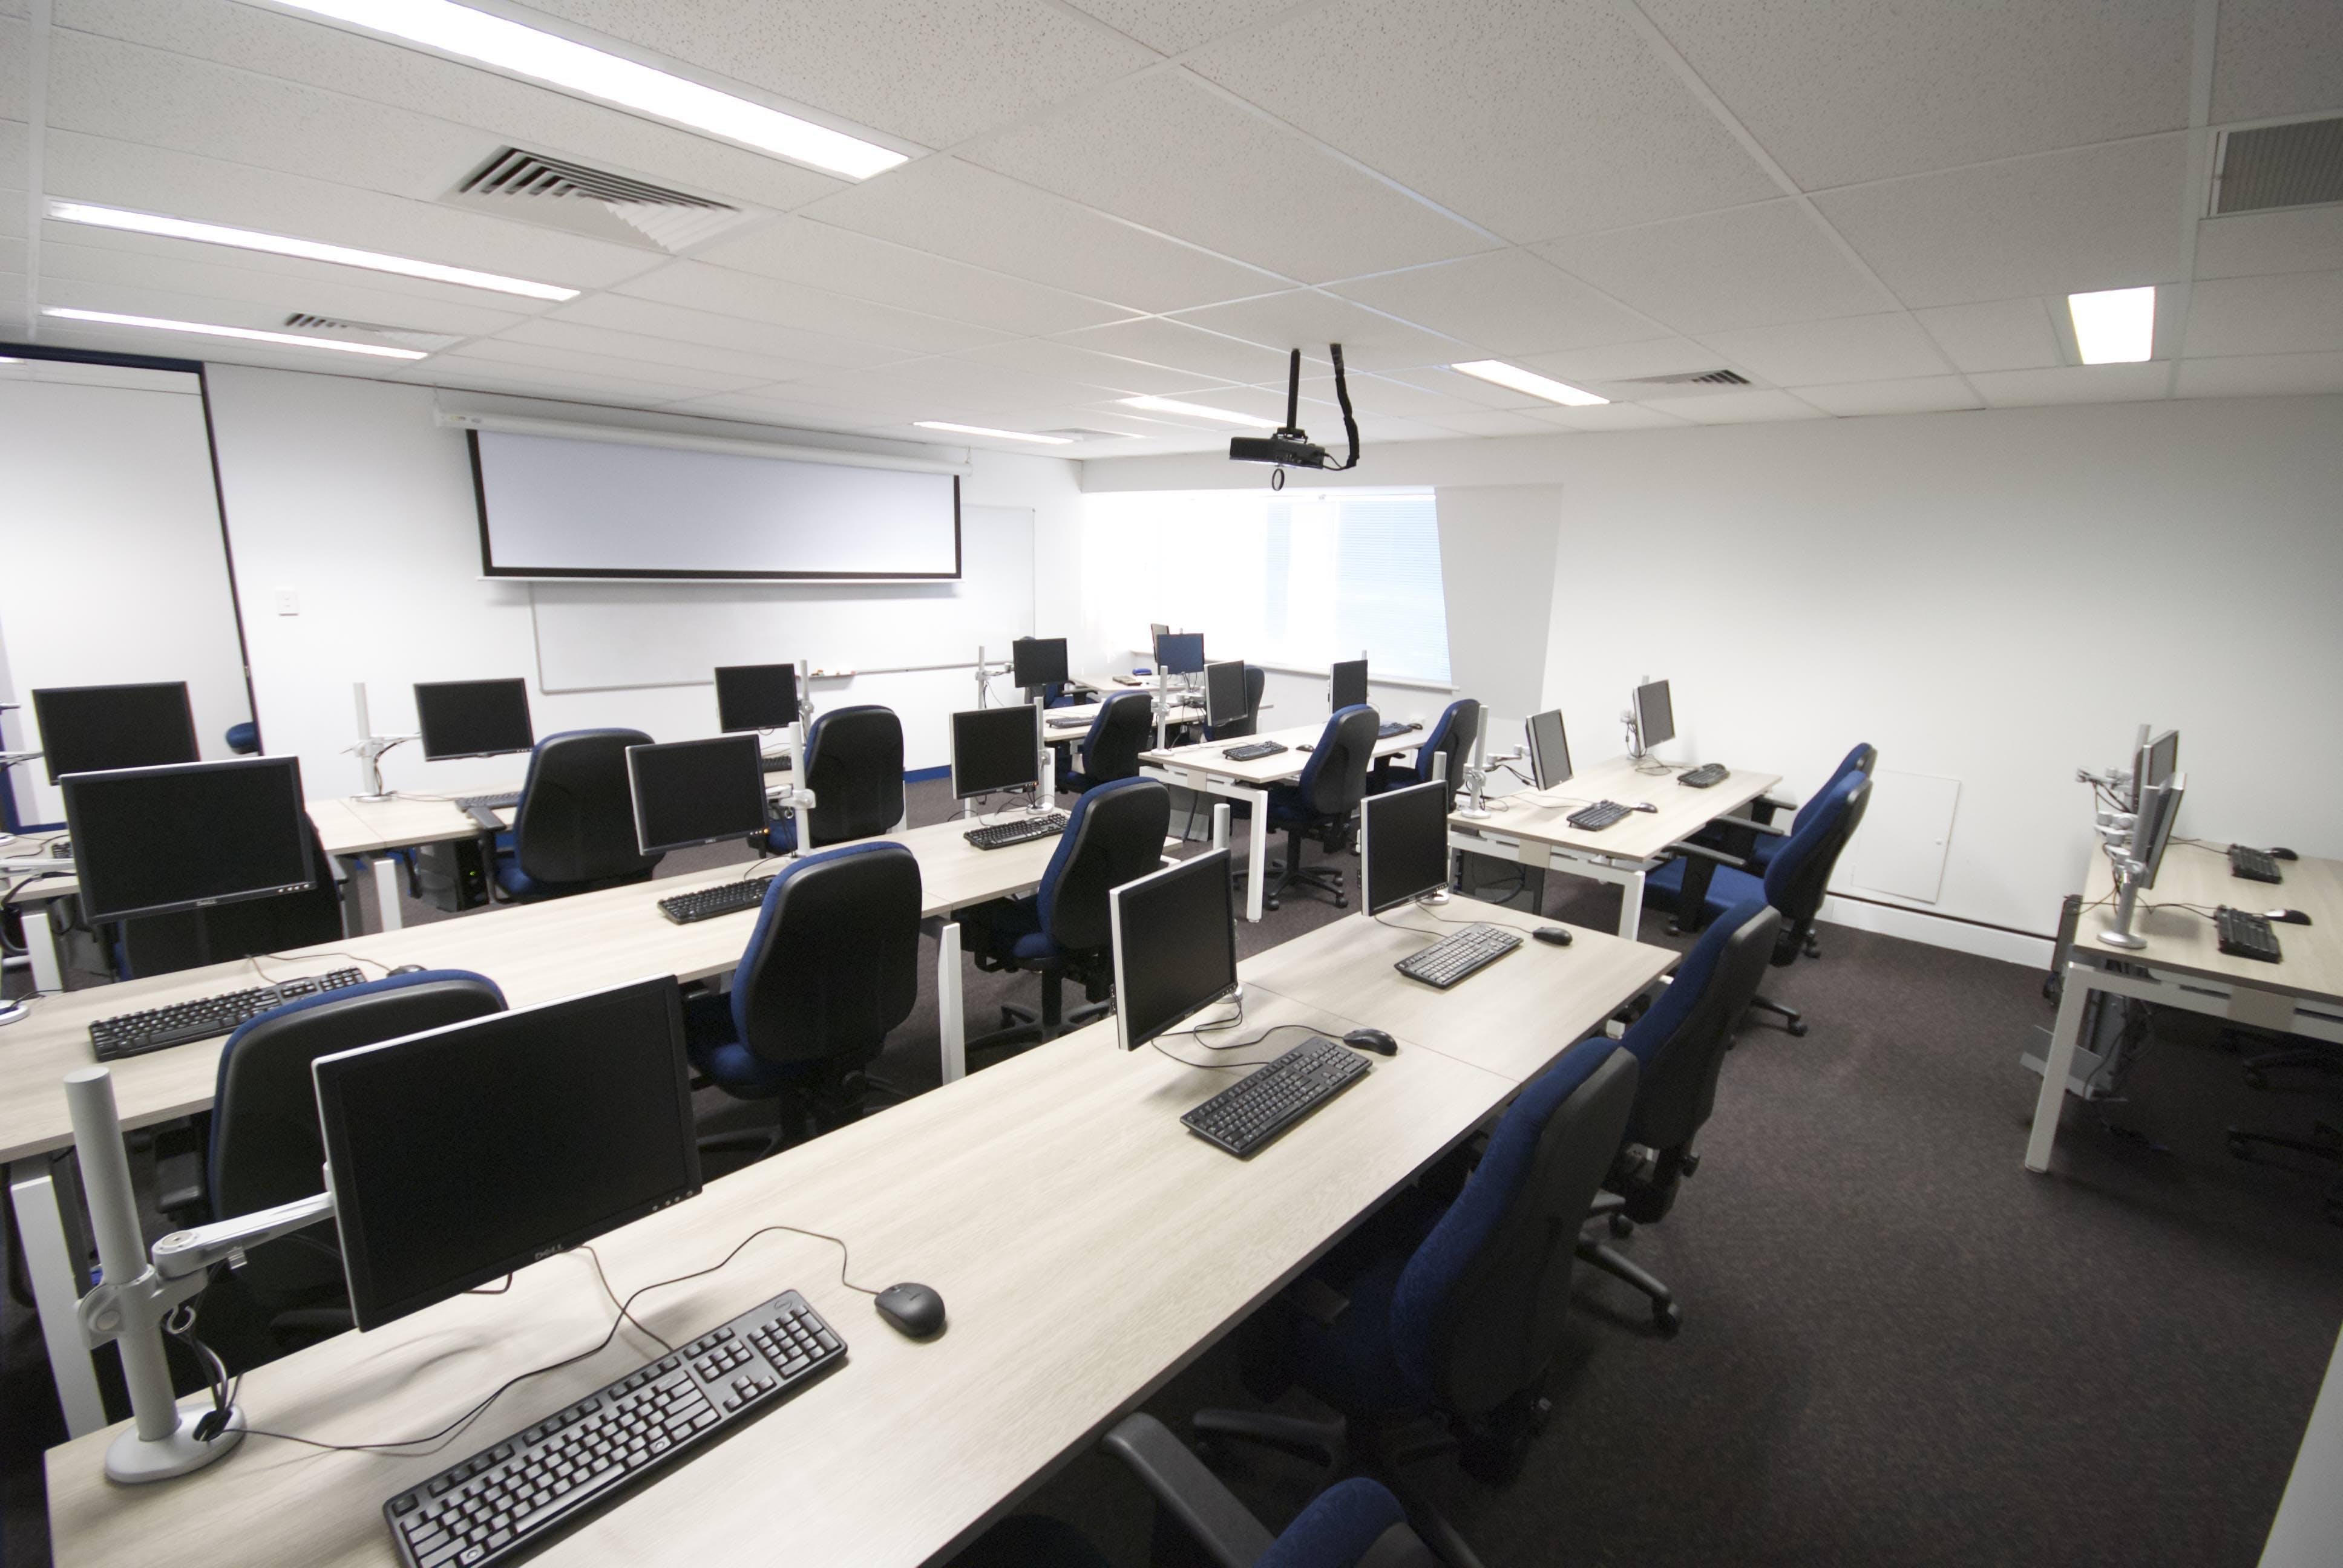 Boardroom/Training Room, meeting room at Sitting Rooms, image 3